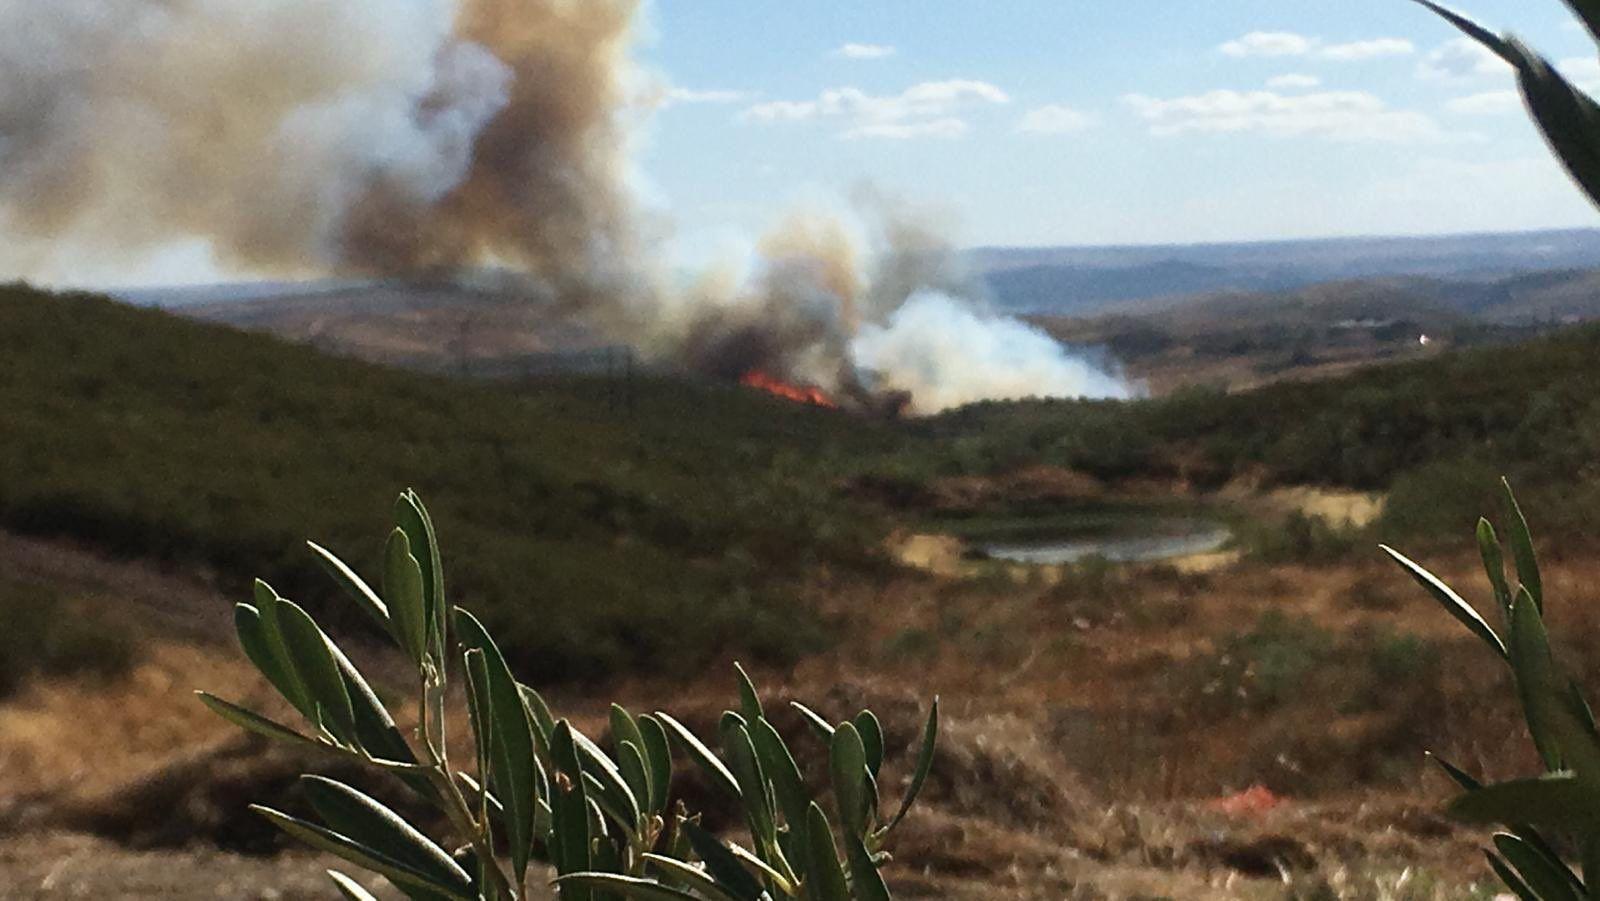 Incendio forestal en Cañaveral